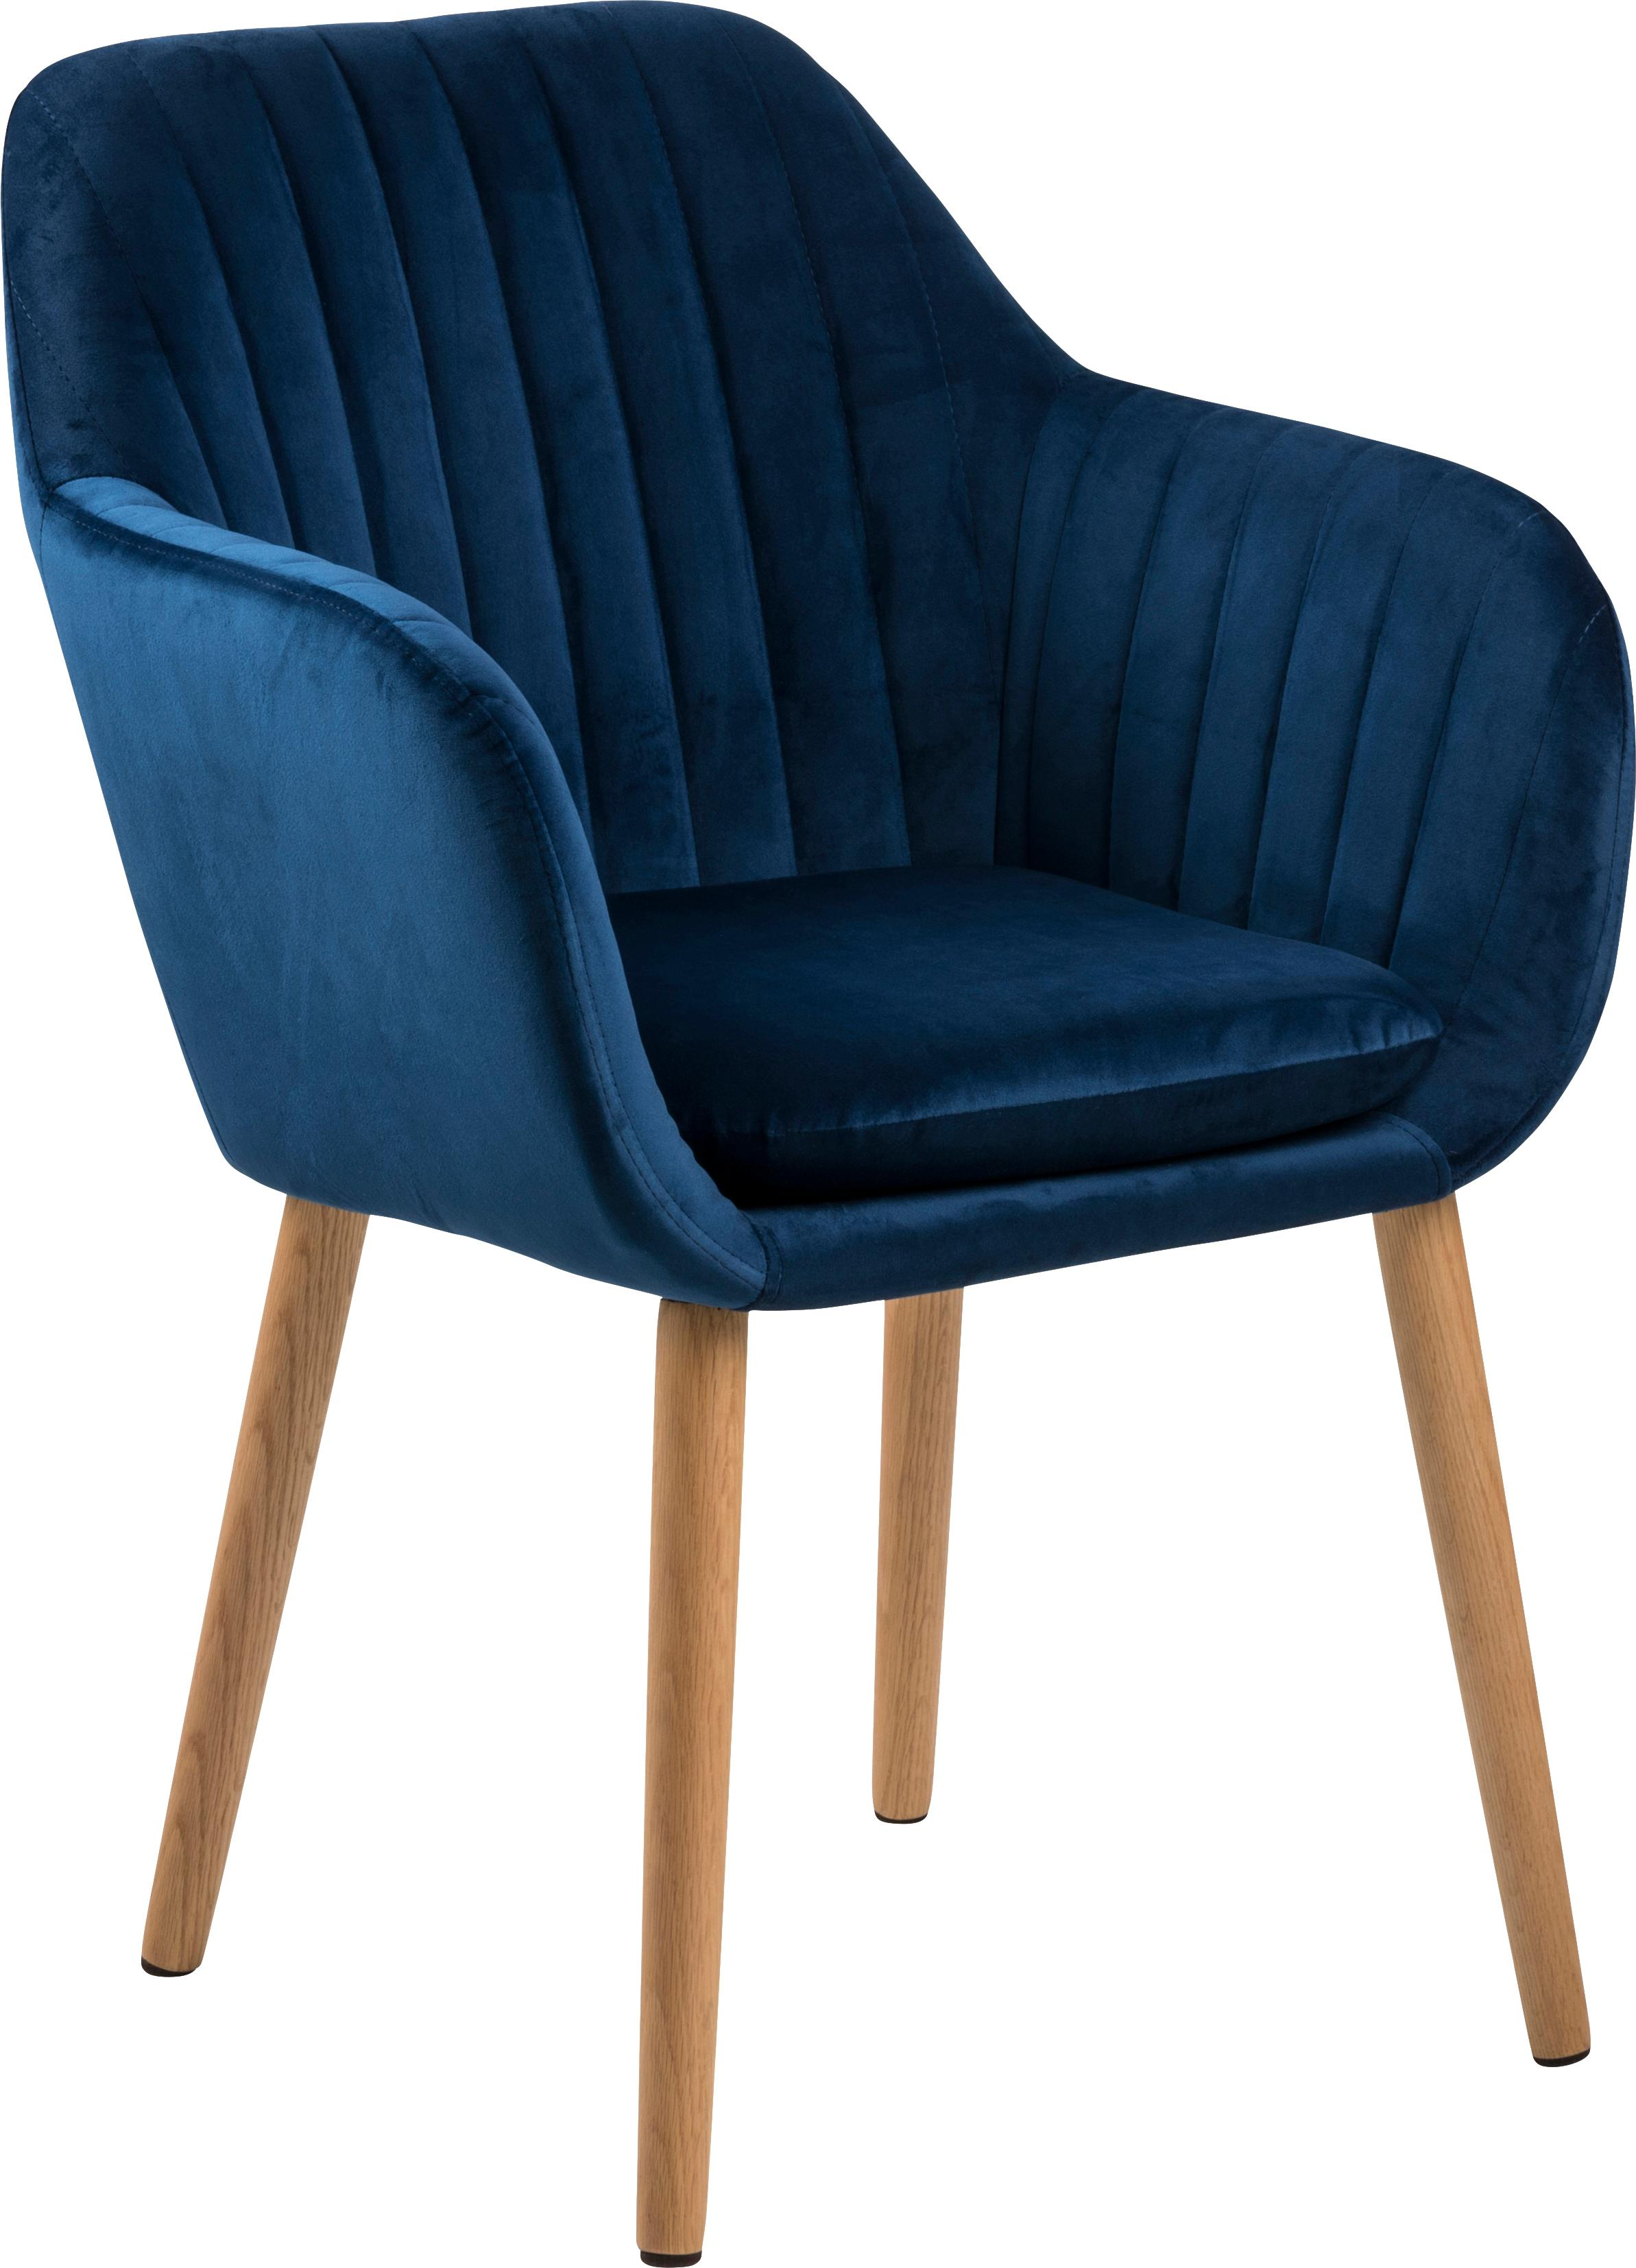 Fluwelen armstoel Emilia, Bekleding: polyester (fluweel), Poten: geolied eikenhout, Bekleding: donkerblauw. Poten: eikenhoutkleurig, B 57 x D 59 cm